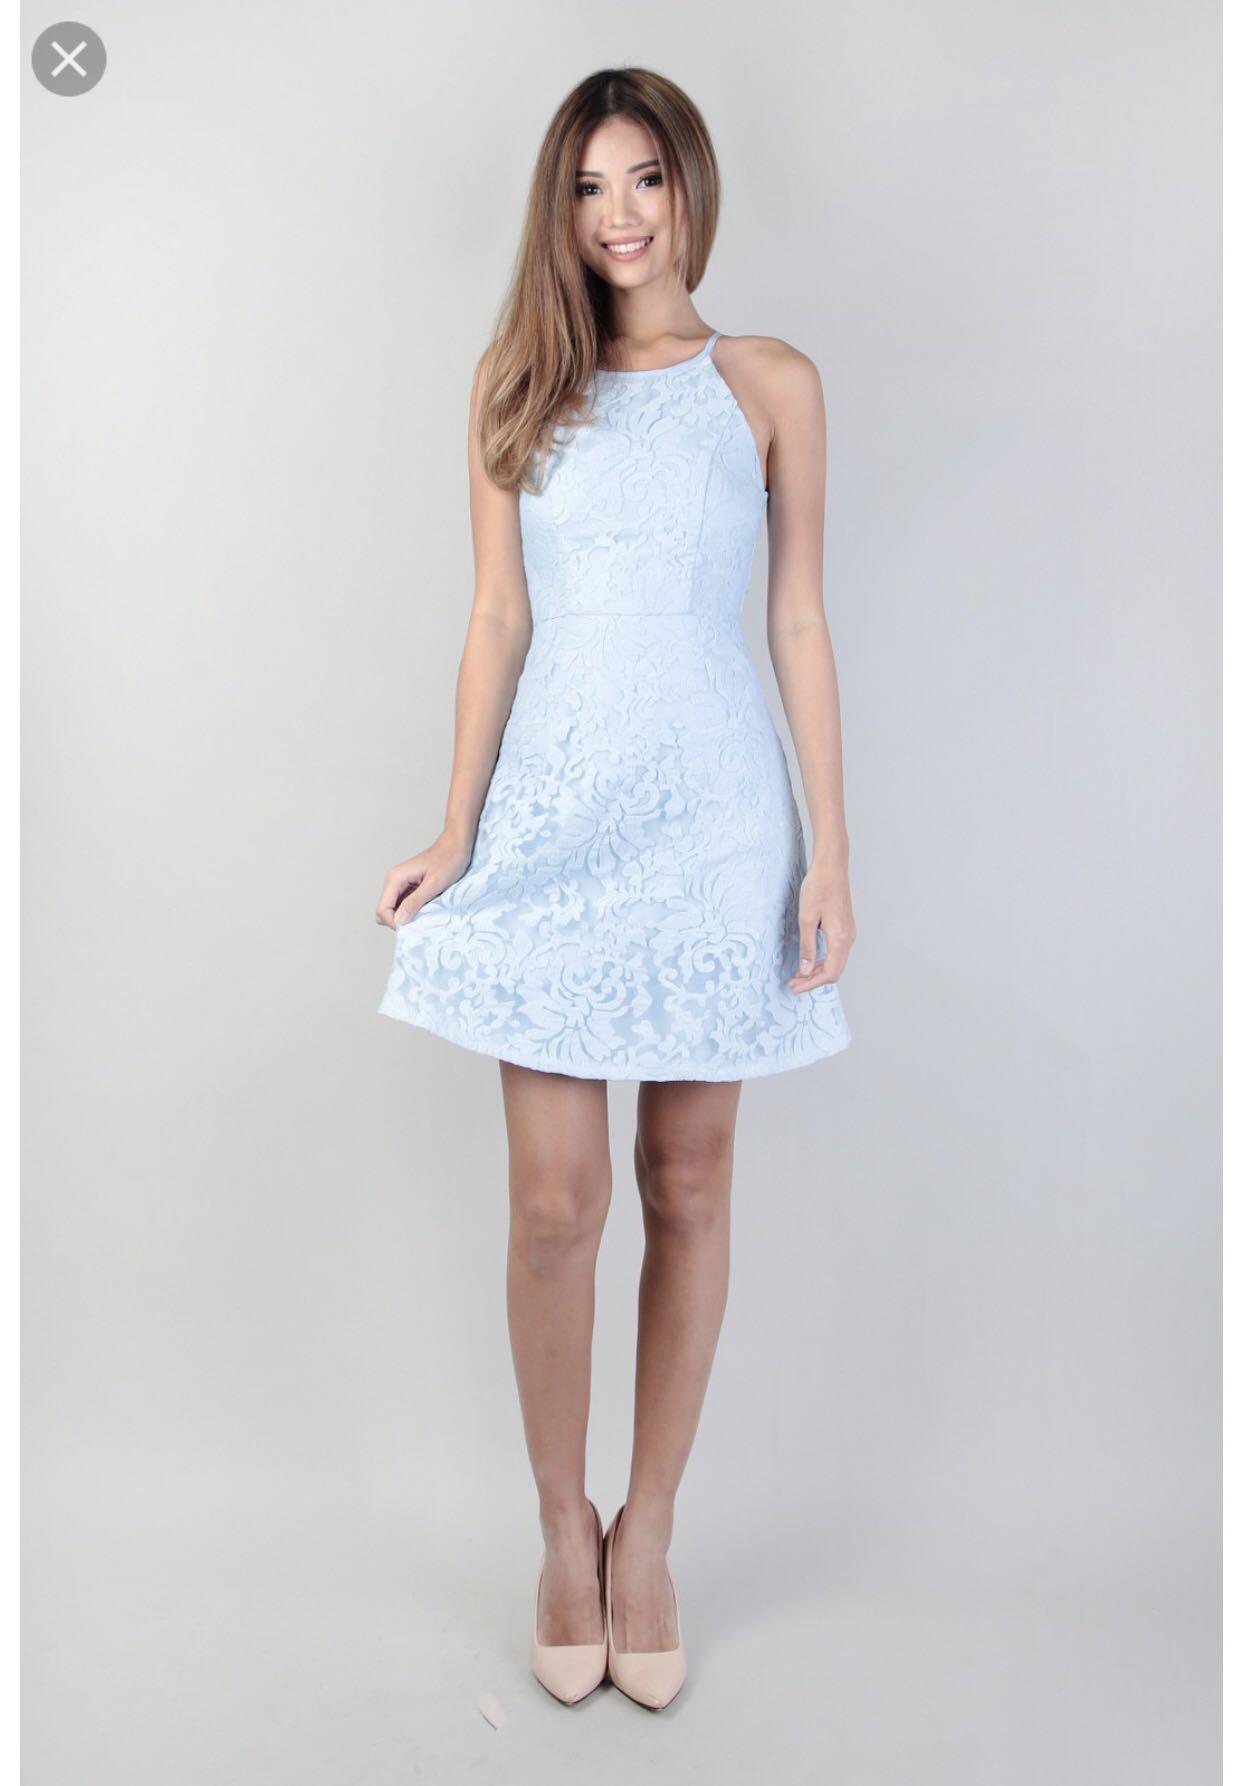 Powder Blue Lace Dress